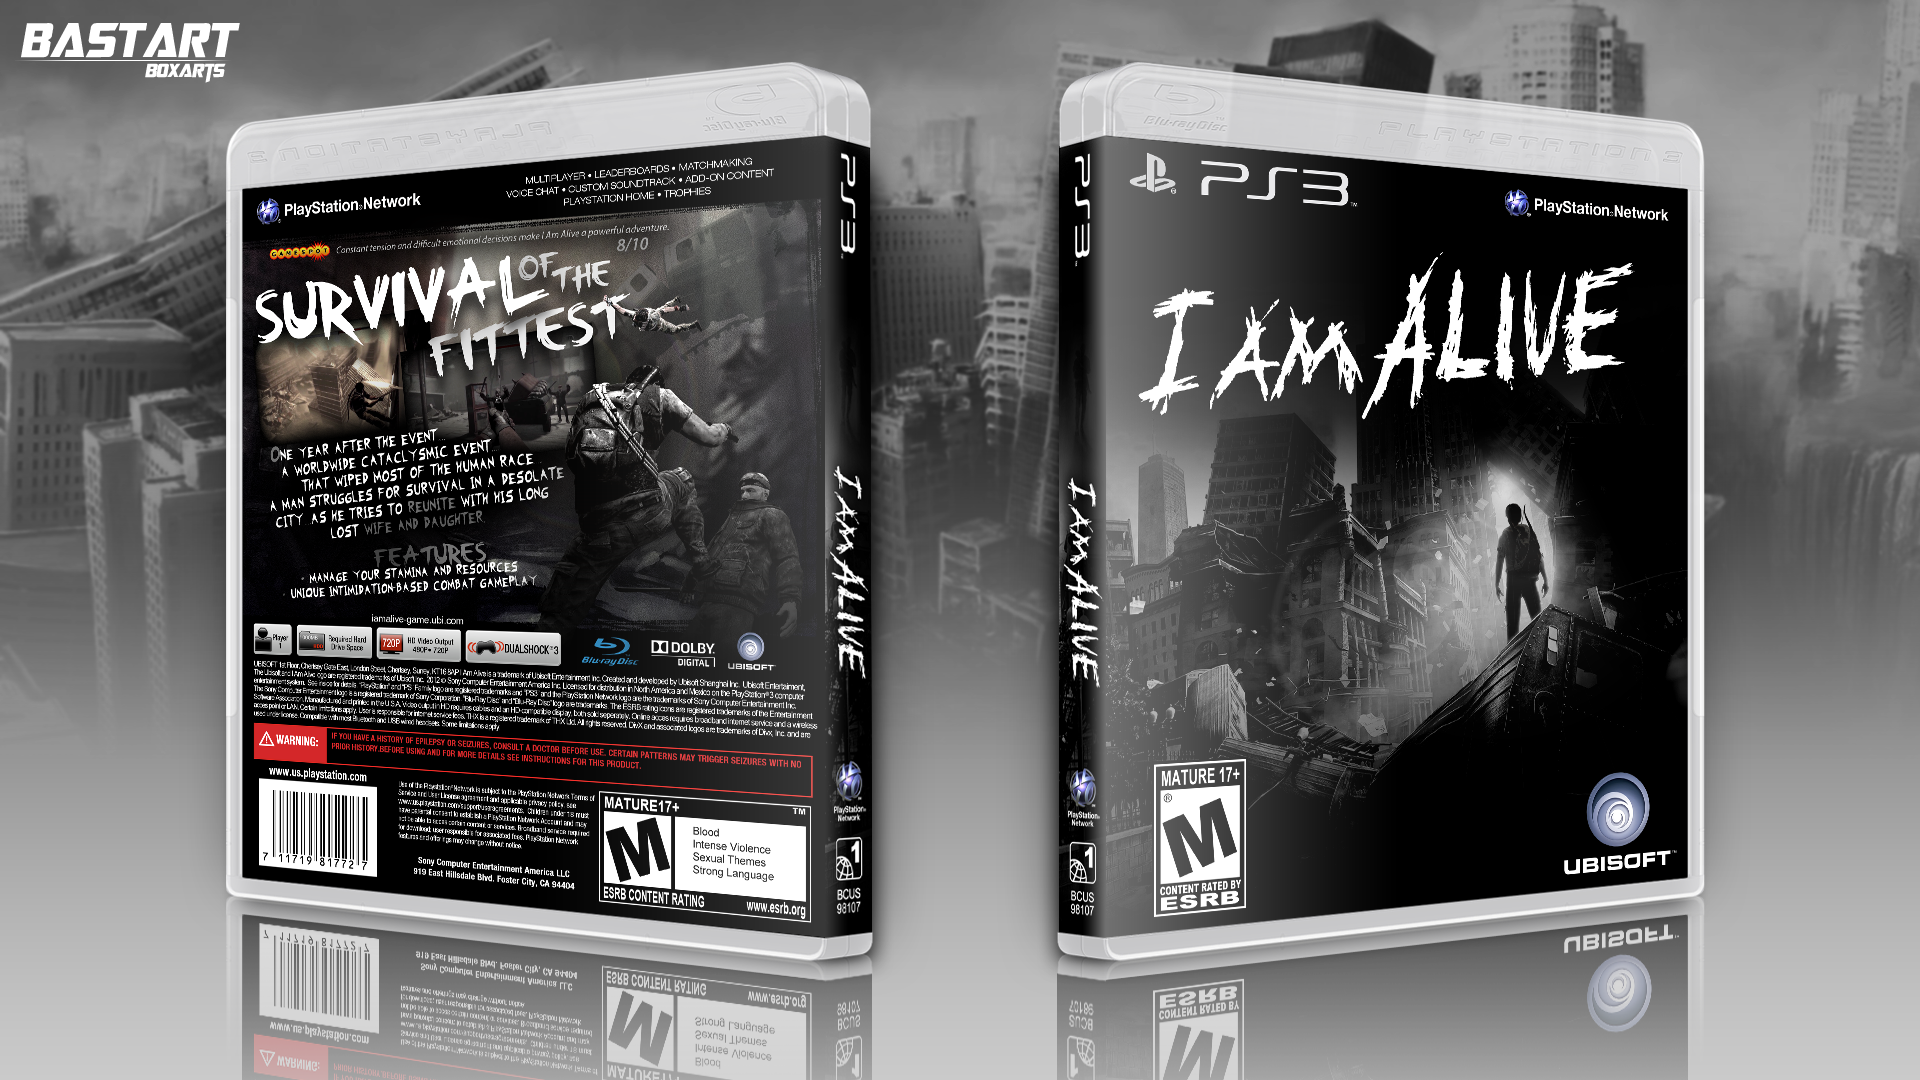 I Am Alive Playstation 3 Box Art Cover By Bastart